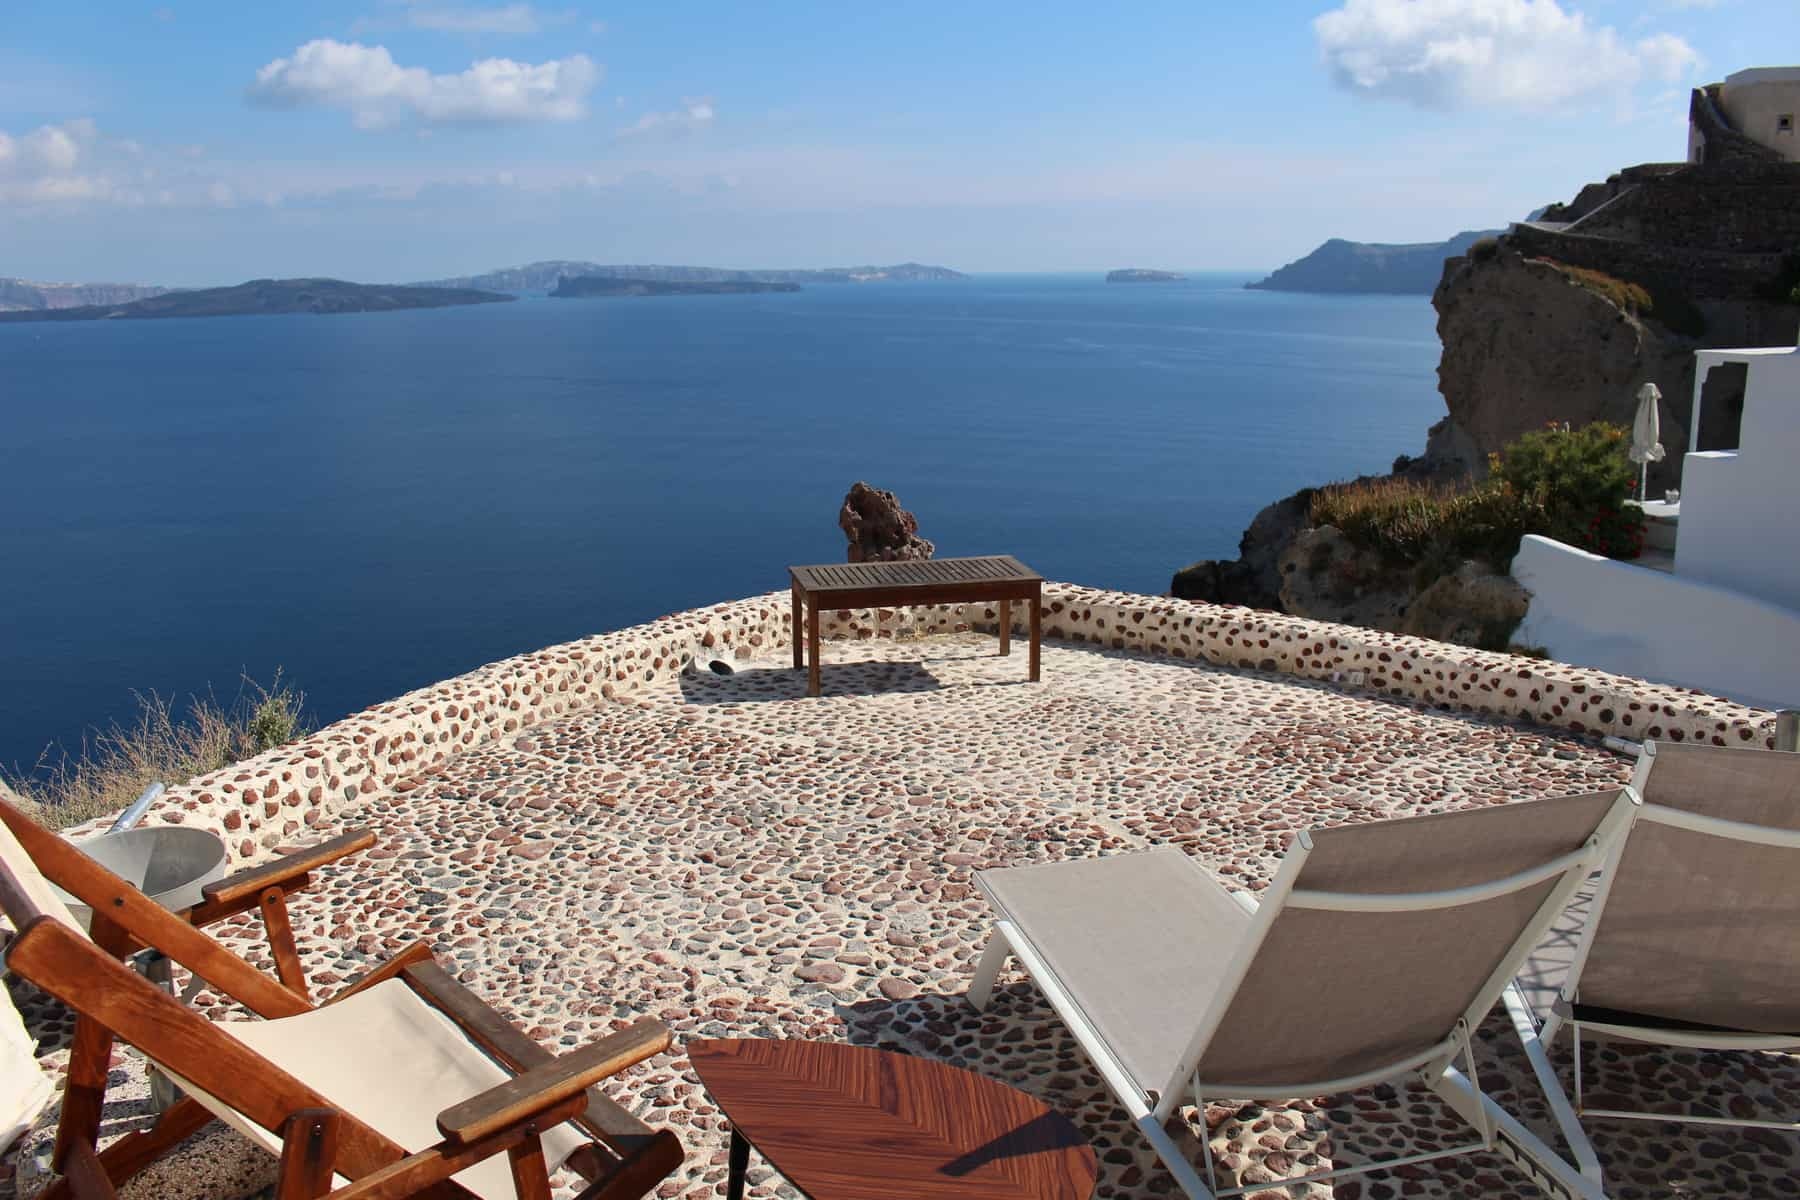 Santorini Balcony